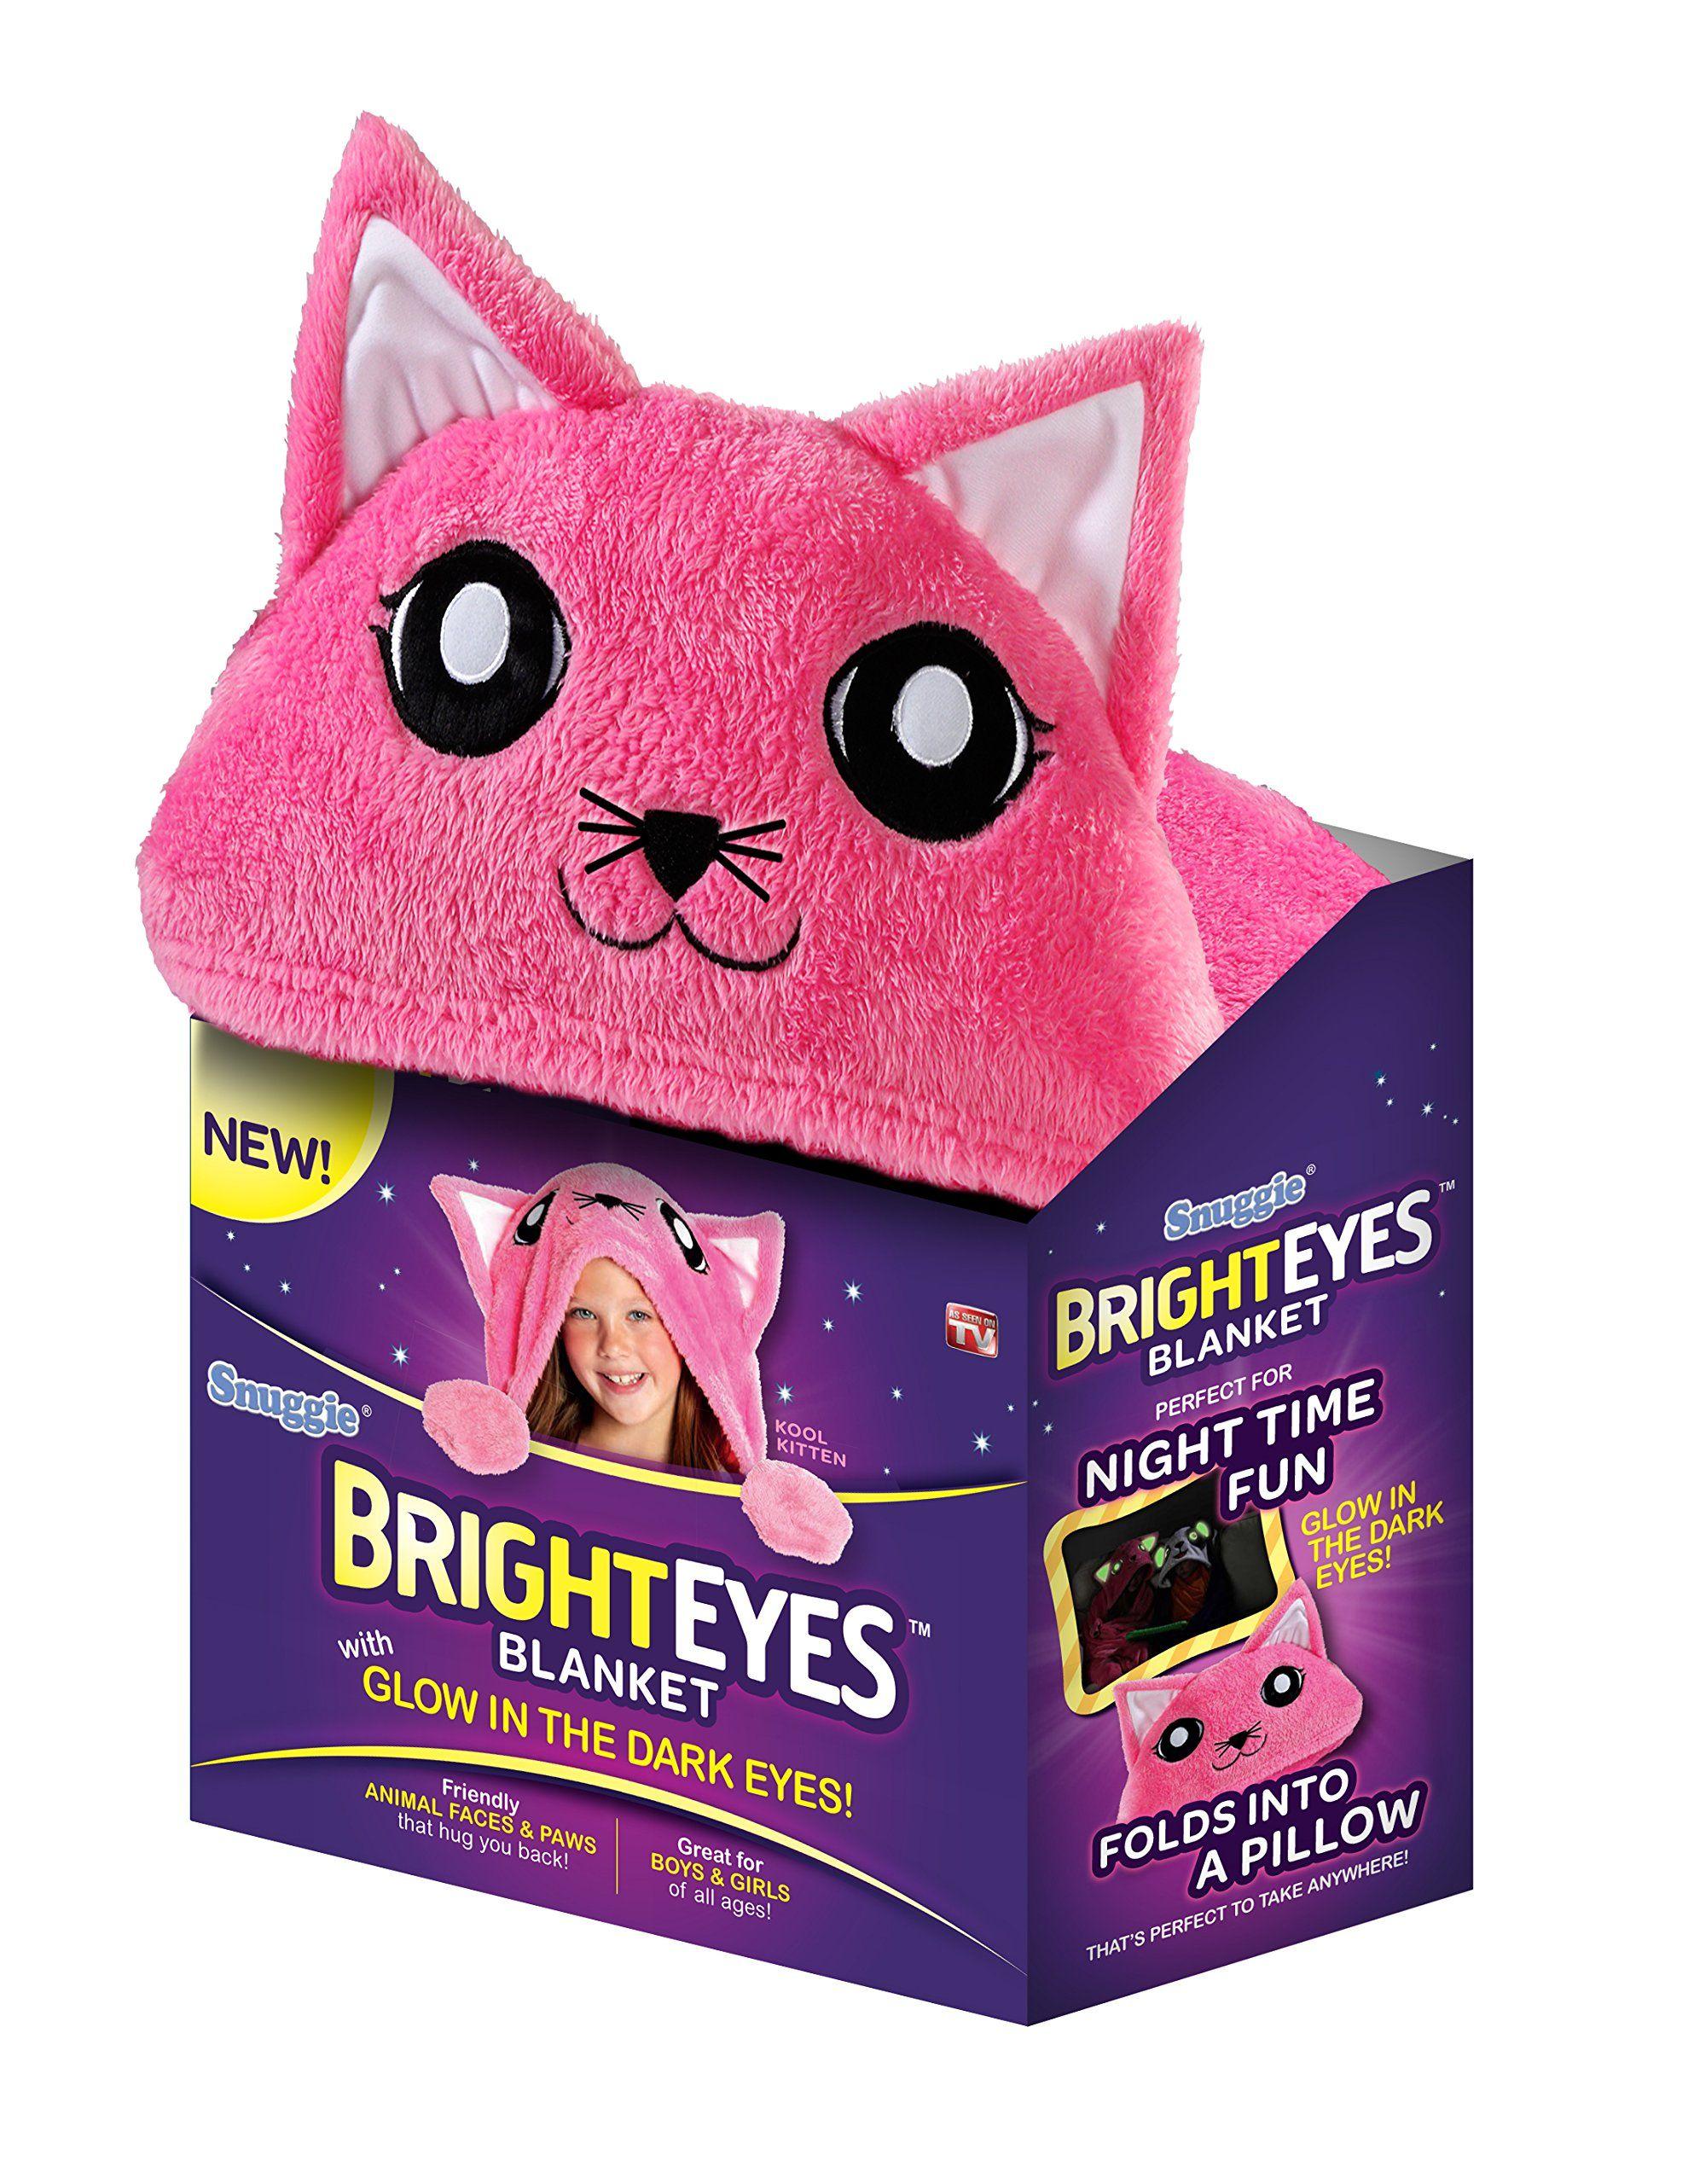 Bright Eyes Blanket By Snuggie Pink Kitten Eye Blanket Kids Blankets Snuggie Blanket